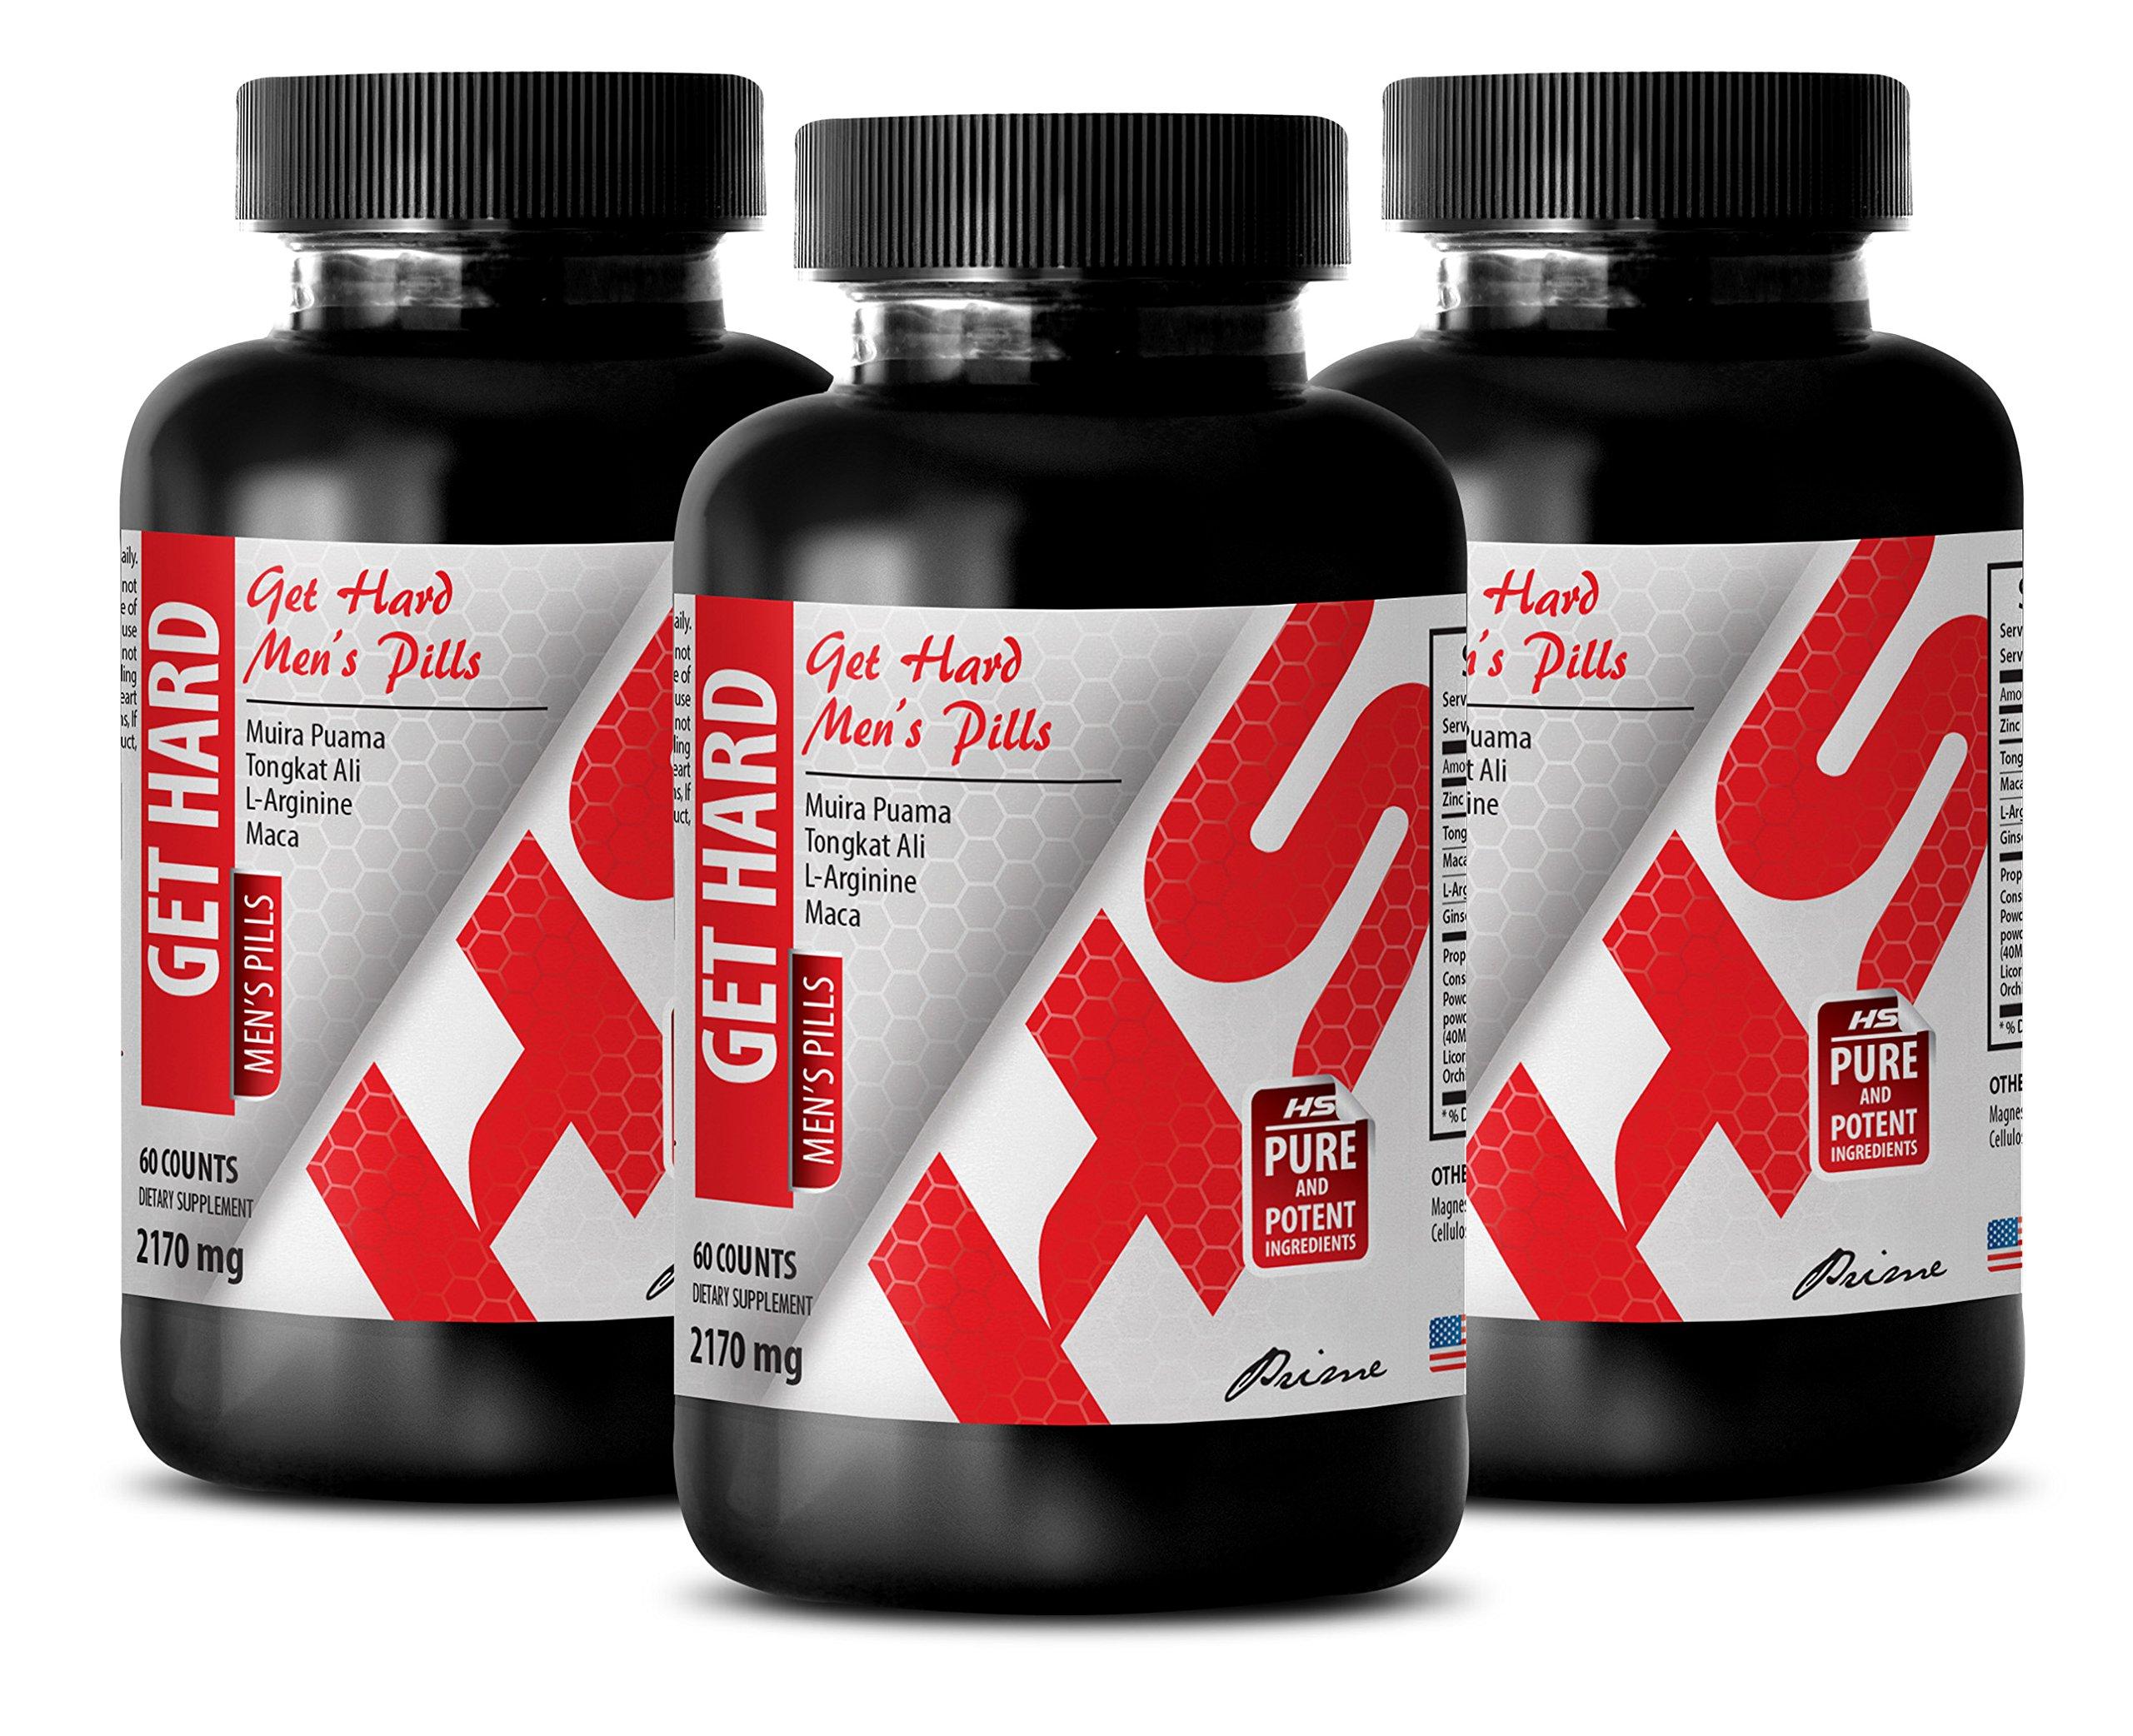 energy booster - GET HARD - MENS PILLS - l-arginine fitness - 3 Bottles (180 Capsules) by Healthy Supplements LLC